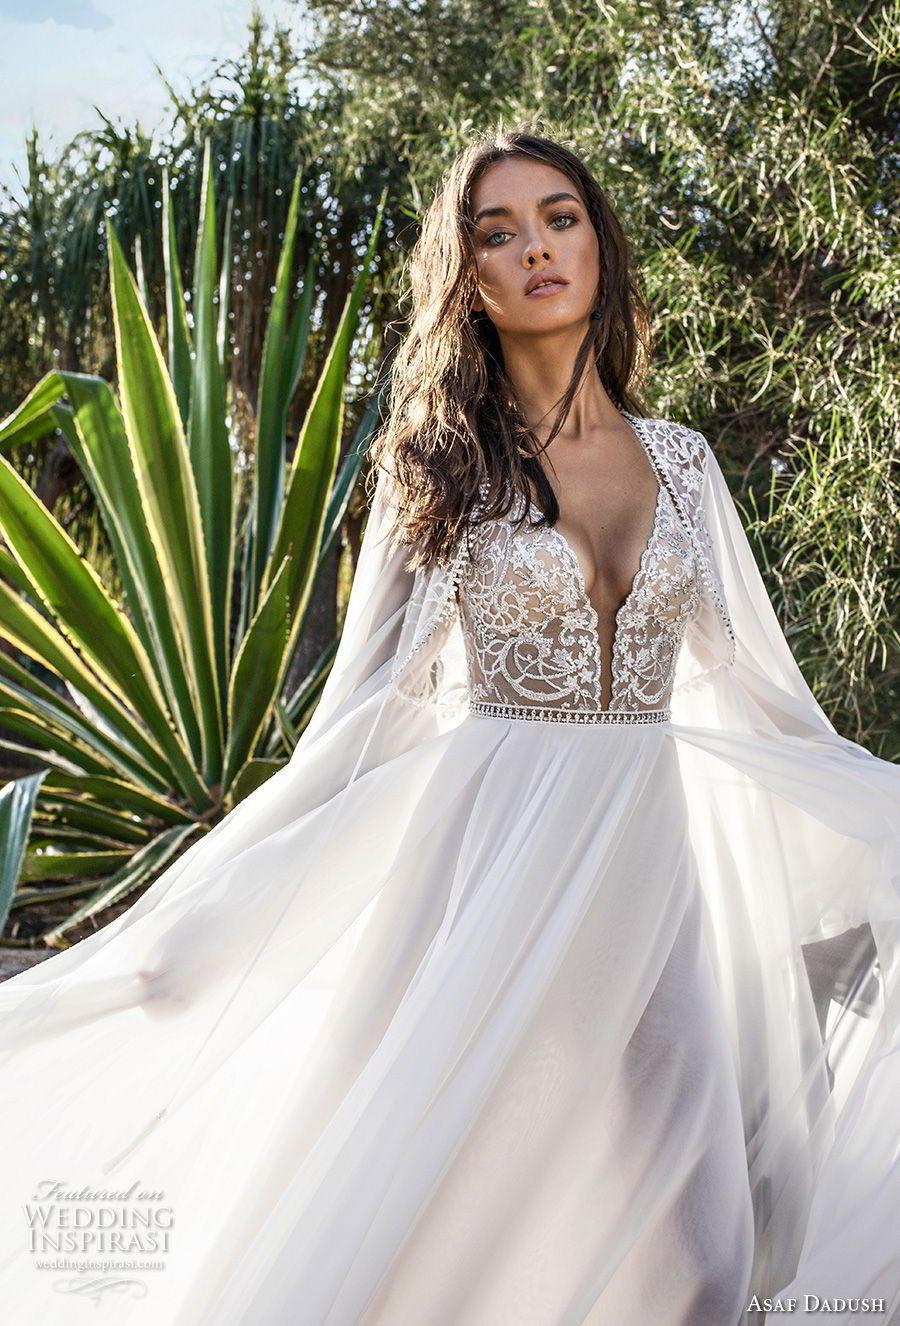 asaf dadush 2018 bridal long sleeves deep plunging sweetheart neckline heavily embellished bodice high slit skirt soft a  line wedding dress covered lace back sweep train (4) zv